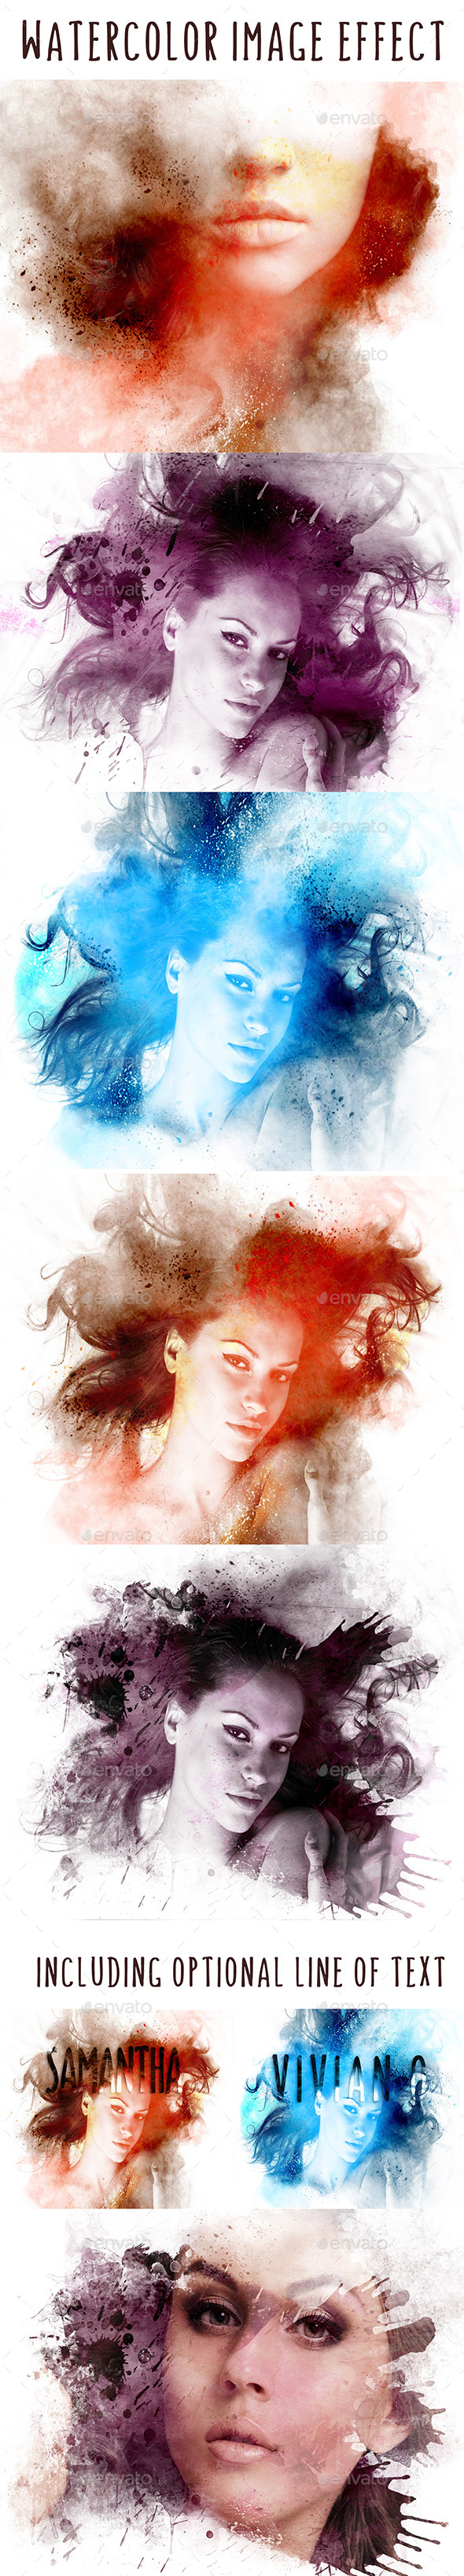 Splash Watercolor Image Effect - Artistic Photo Templates